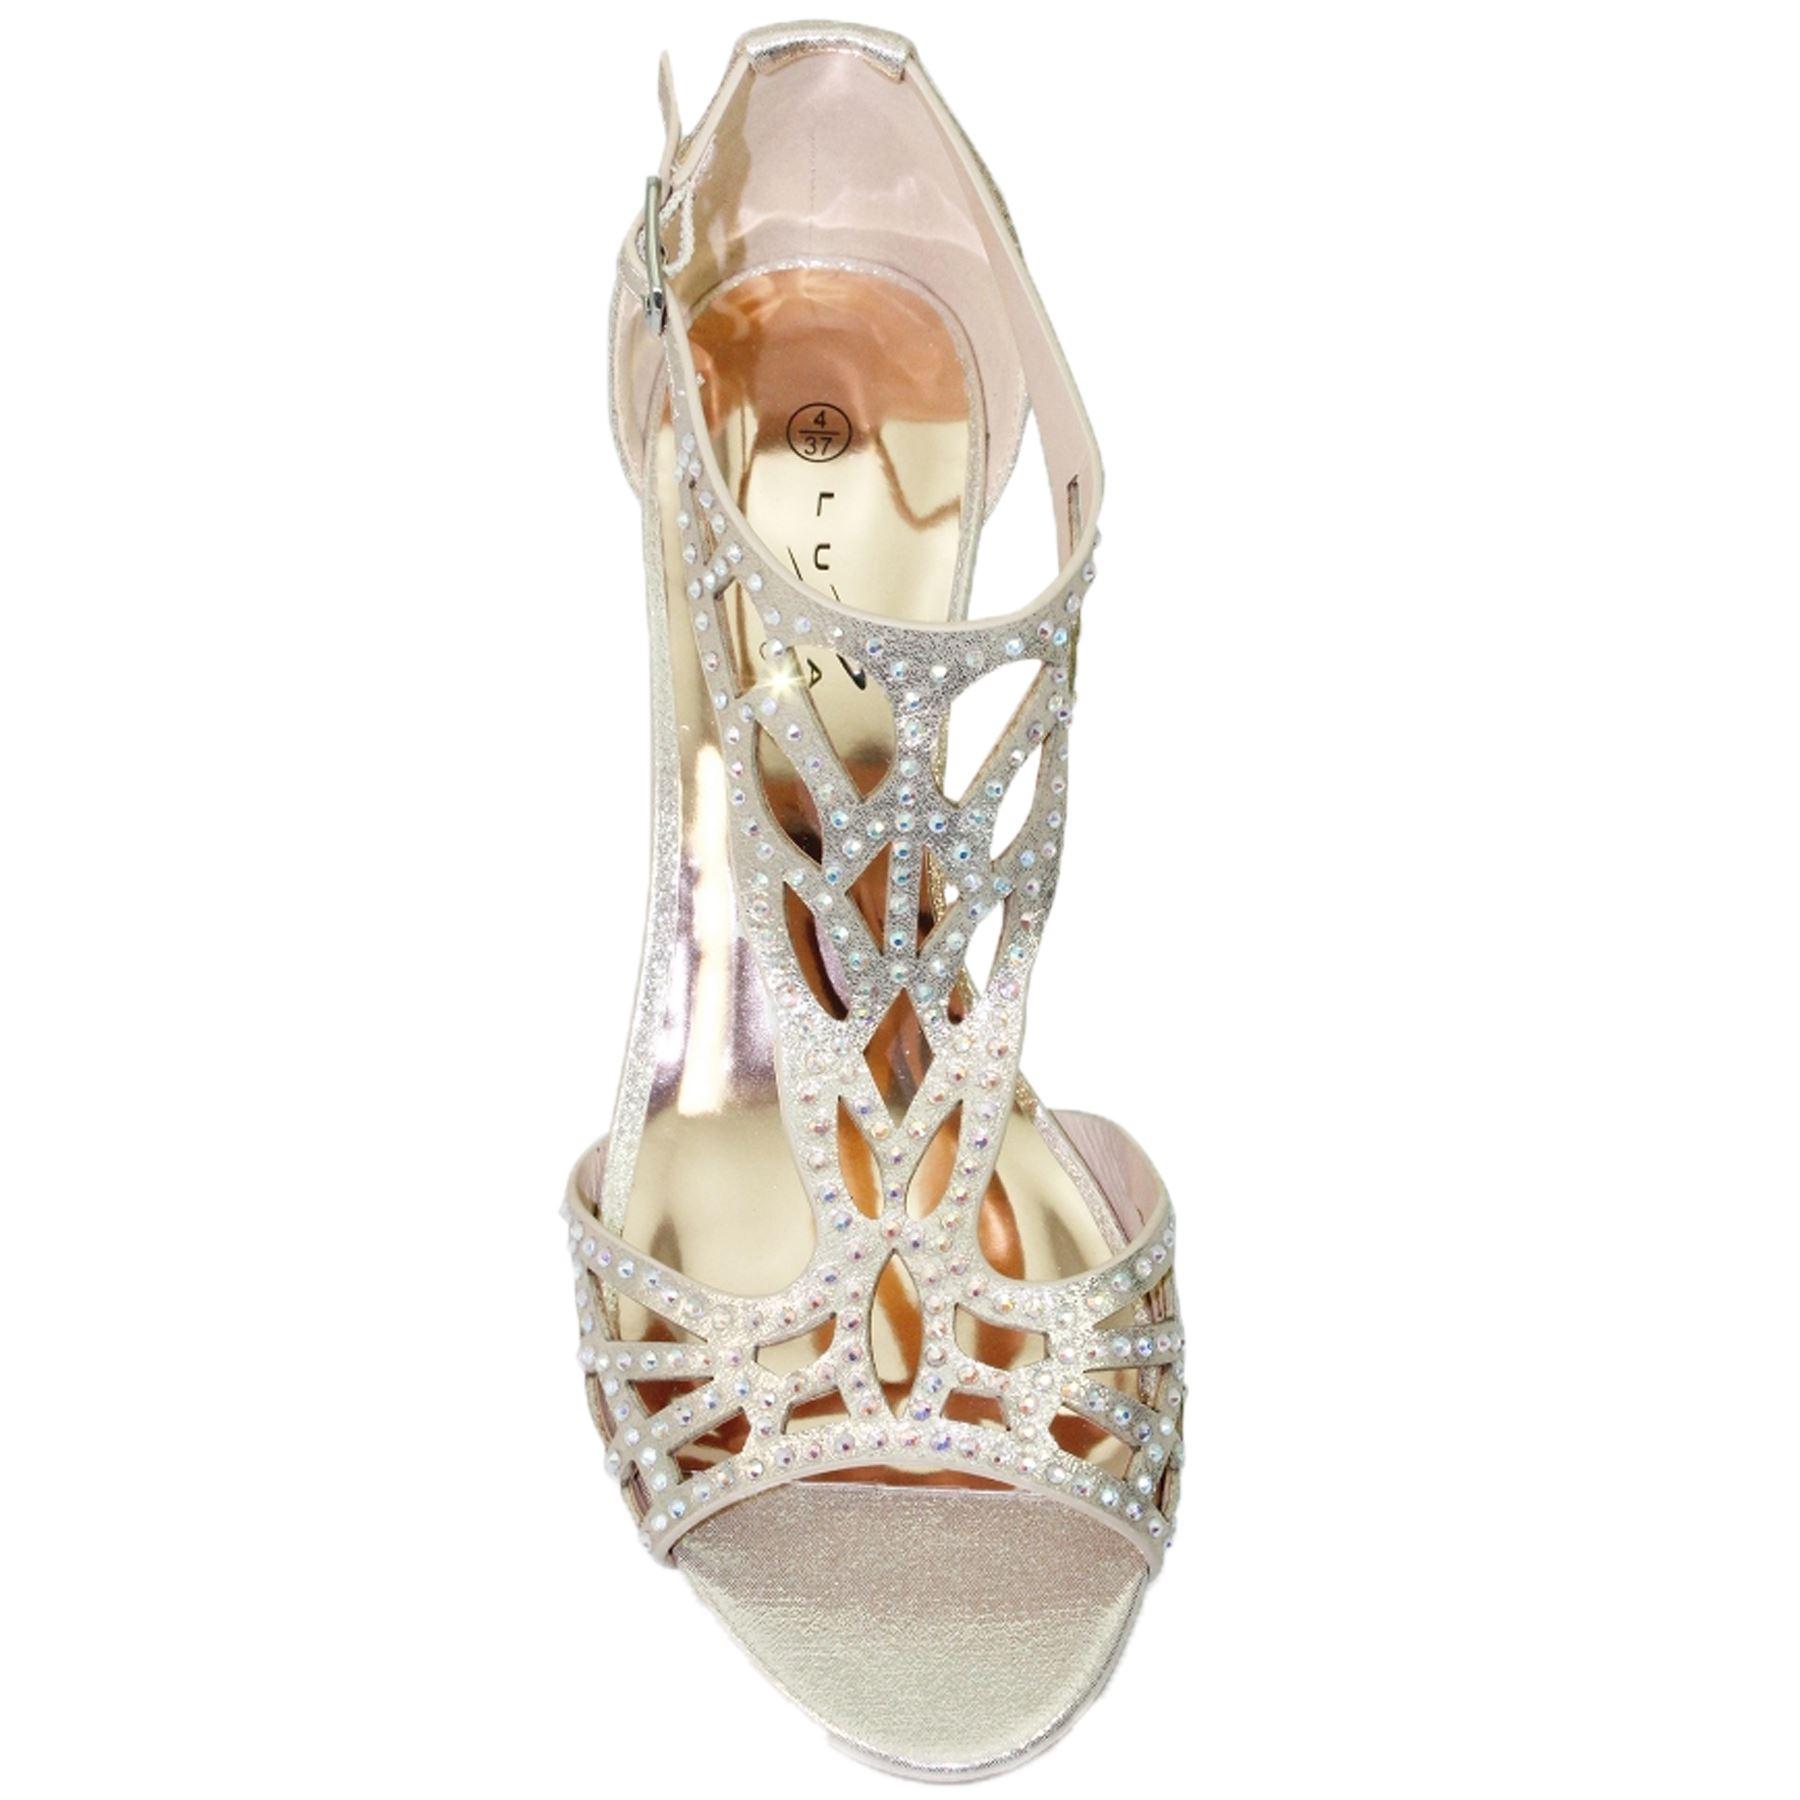 FLC111 Denton Strap Diamante Bag Rhinestone Peep Toe Wedge Sandales Bag Diamante Clutch 71df0b